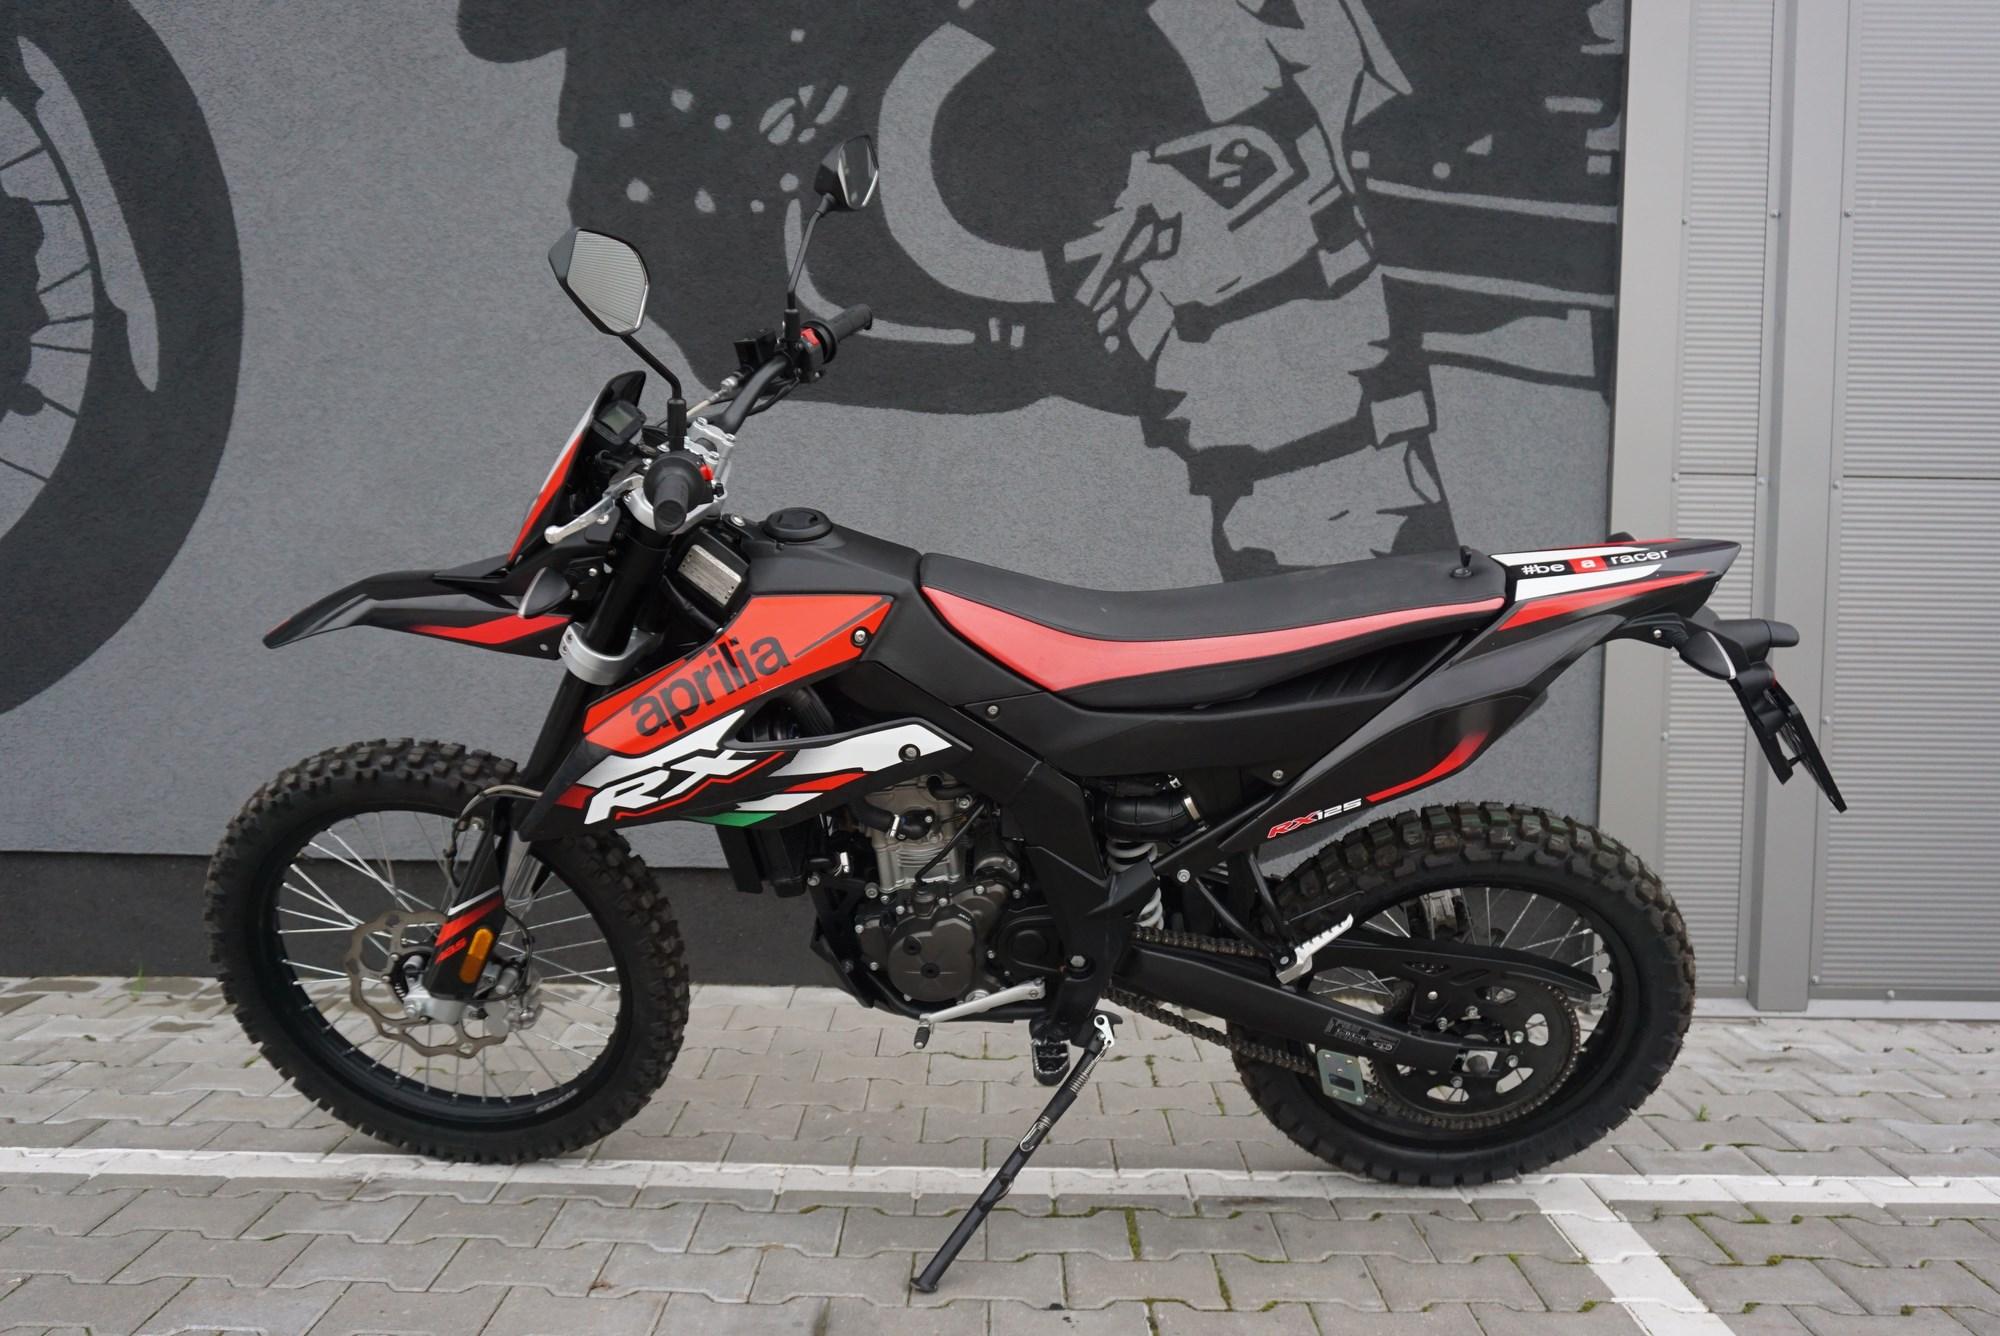 Aprilia RX 125 ABS